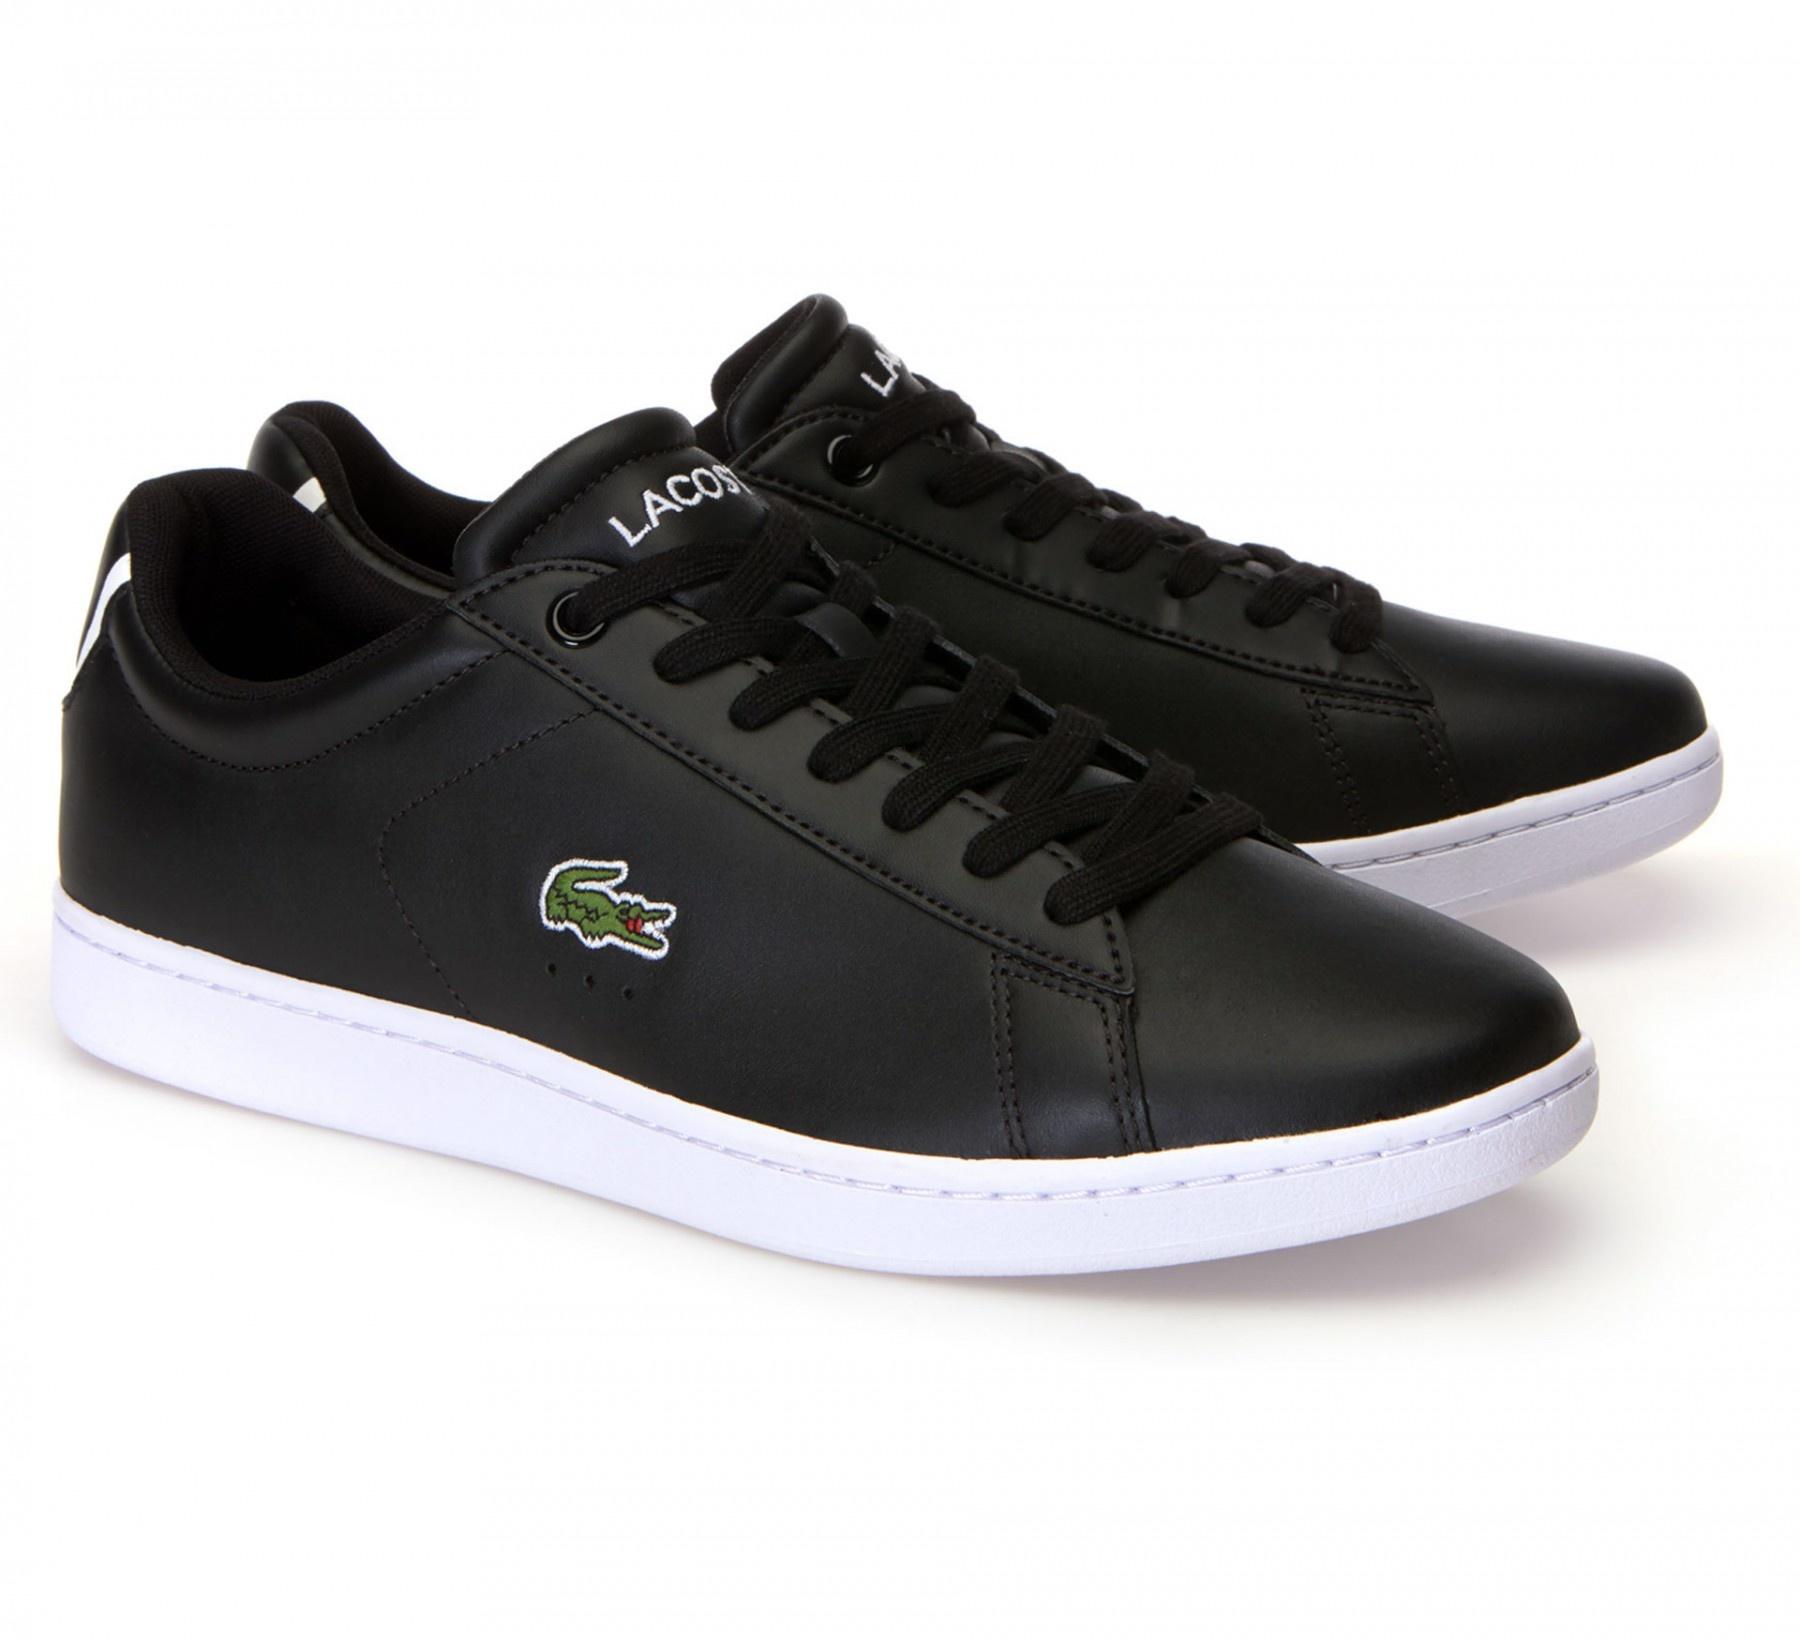 Lacoste / Powercourt BLK/WHT Leather-1